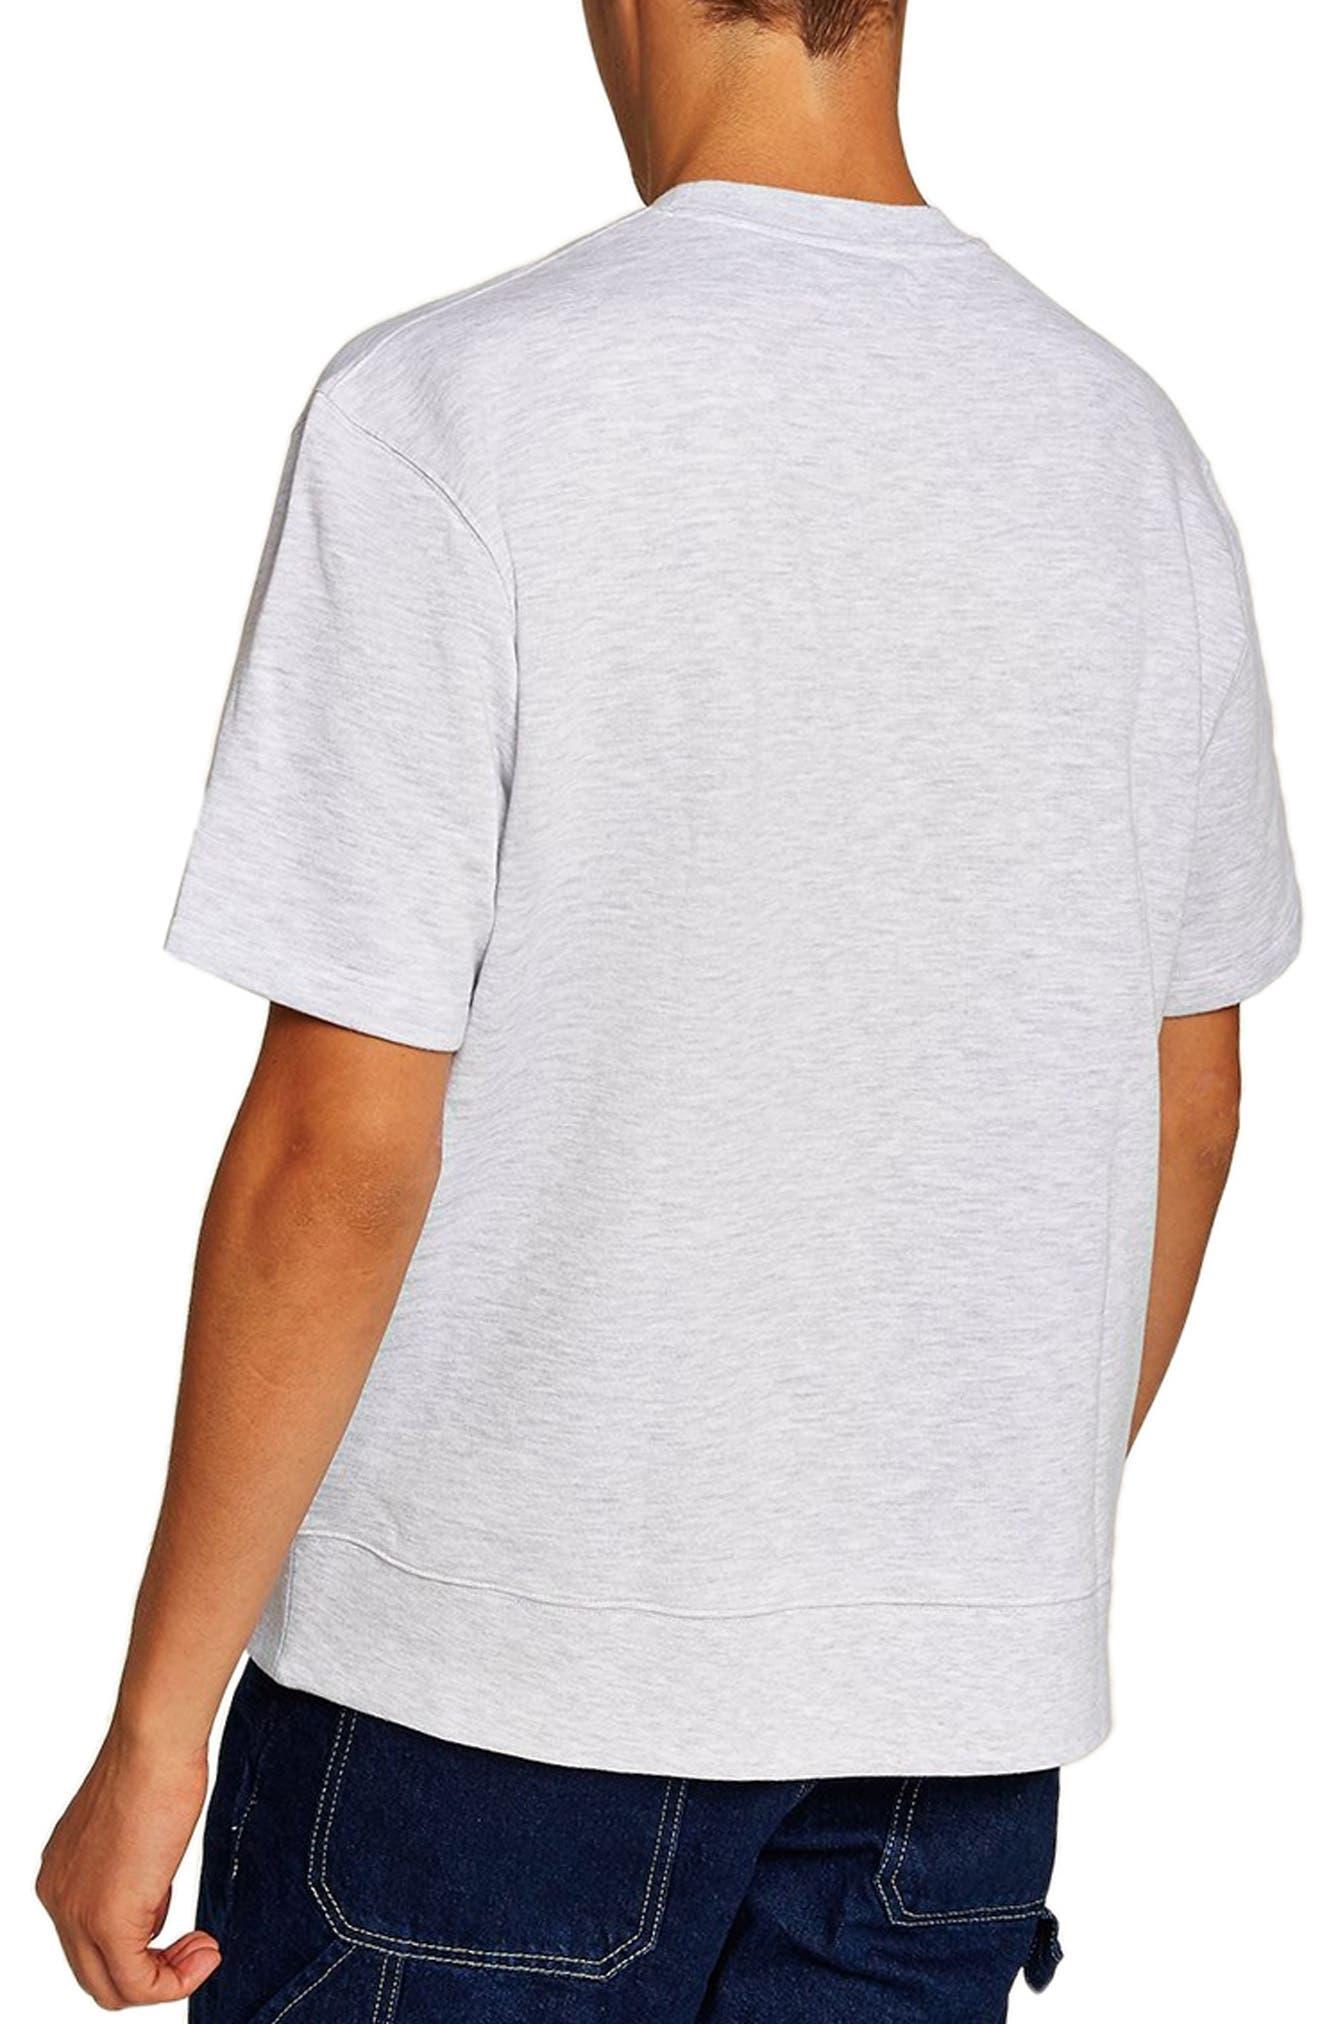 Short Sleeve Crewneck Sweatshirt,                             Alternate thumbnail 2, color,                             LIGHT GREY